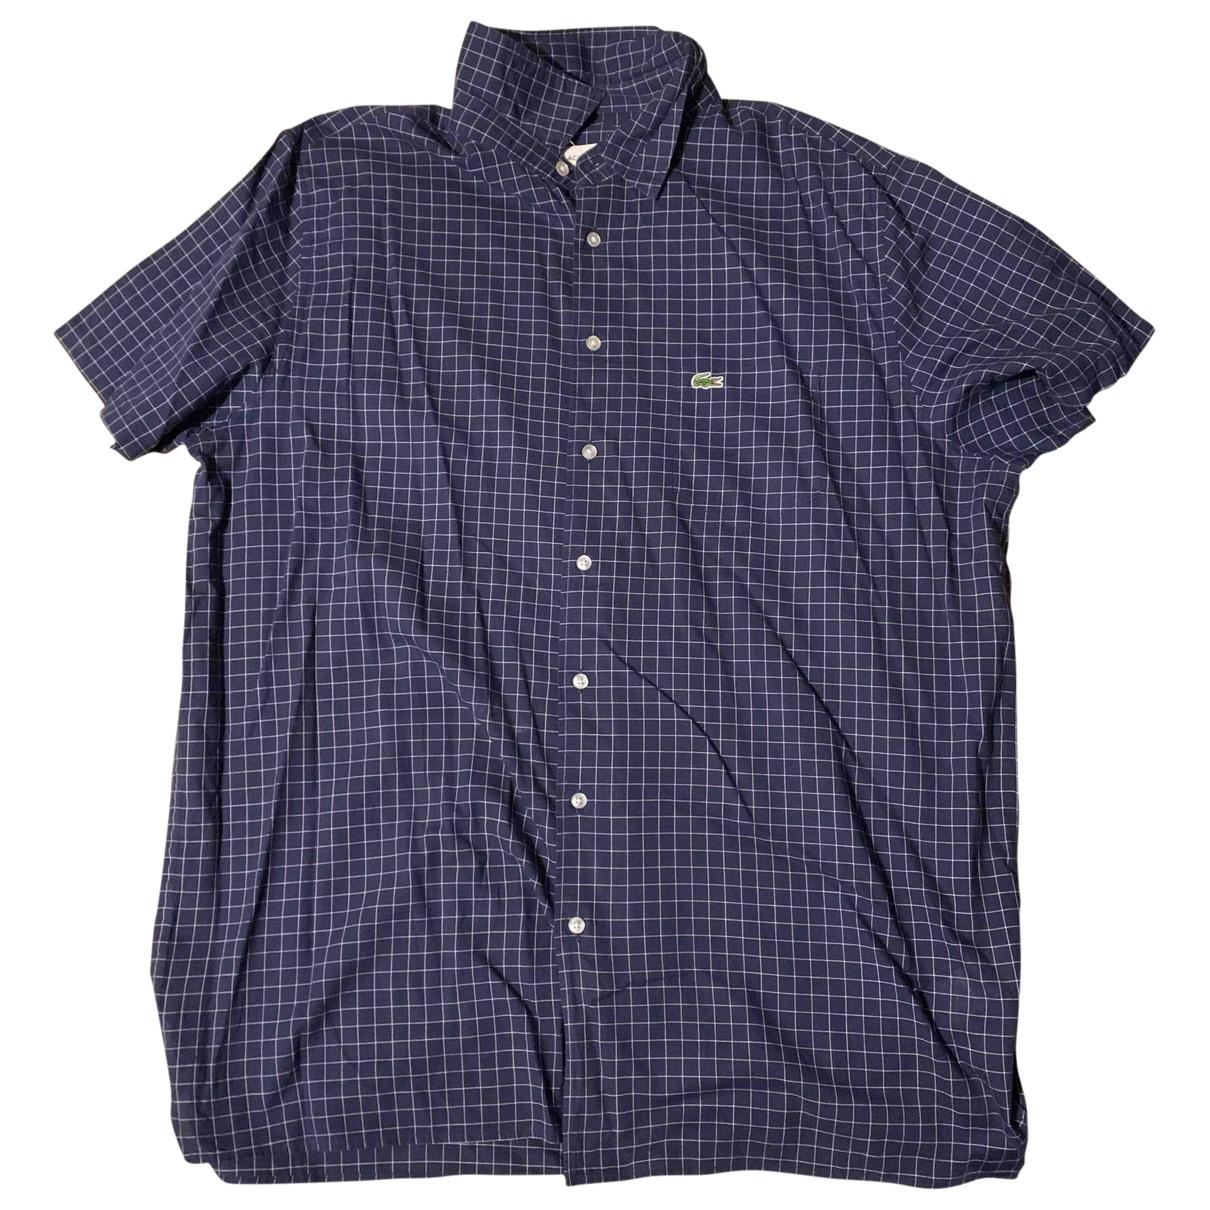 Lacoste \N Blue Cotton Shirts for Men XL International